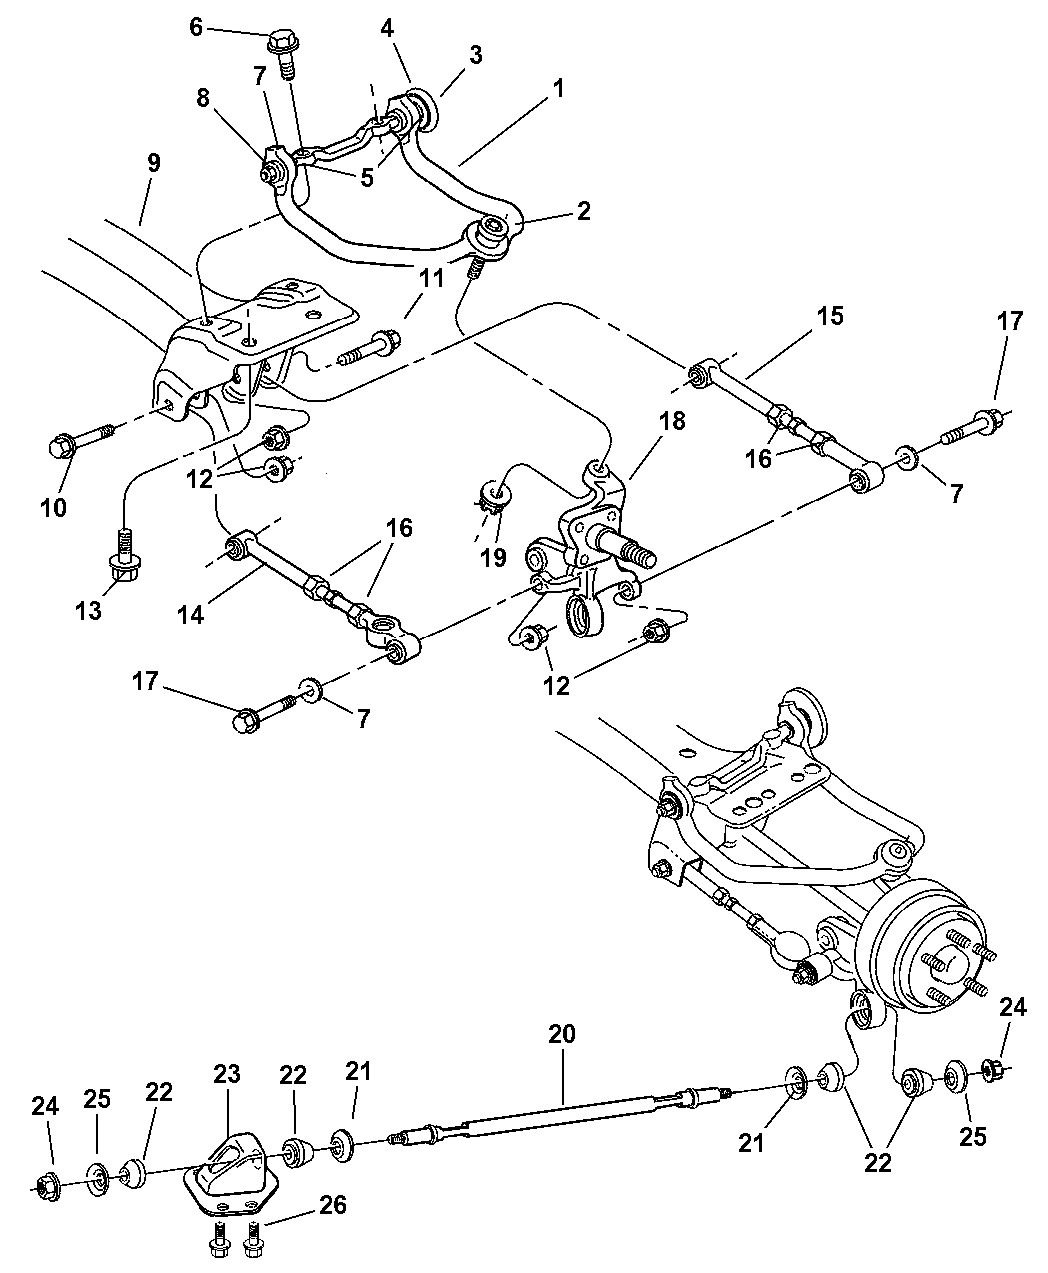 2005 Dodge Stratus Parts Diagram • Wiring Diagram For Free